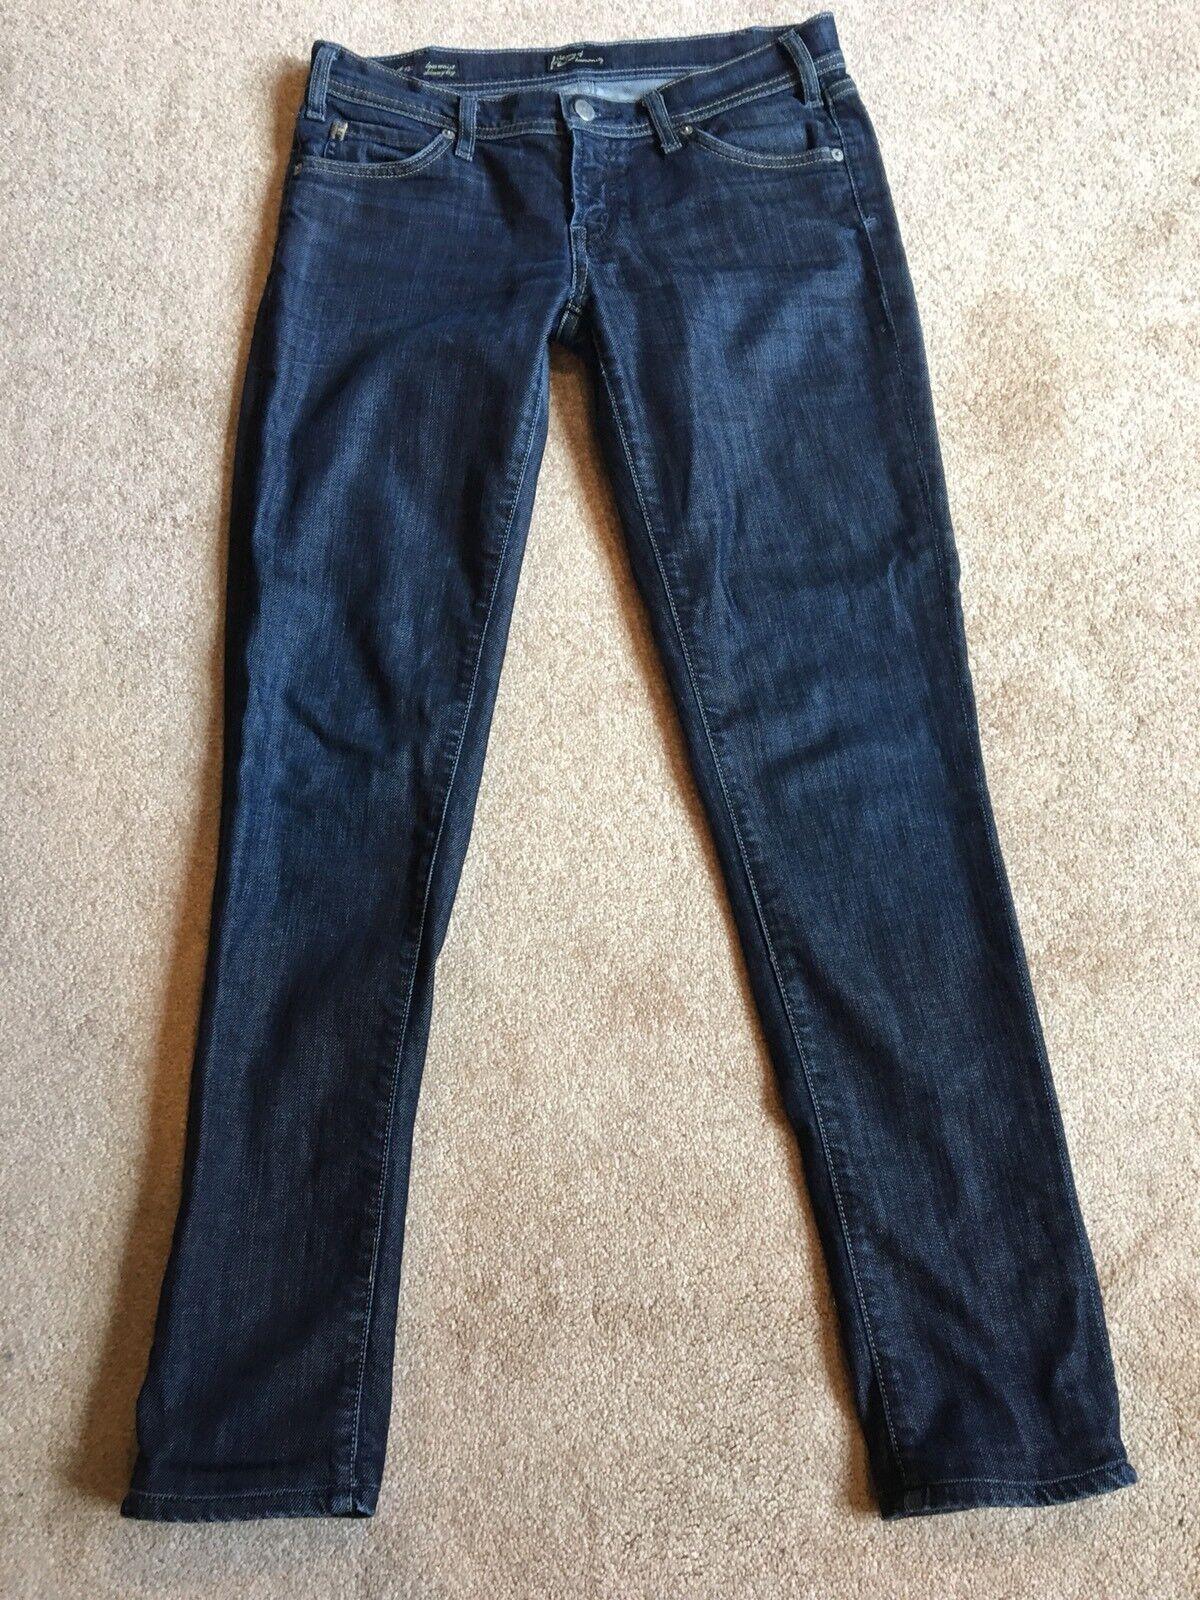 EUC Citizens of Humanity Low Waist Skinny Leg Avedon 133 Stretch Jeans